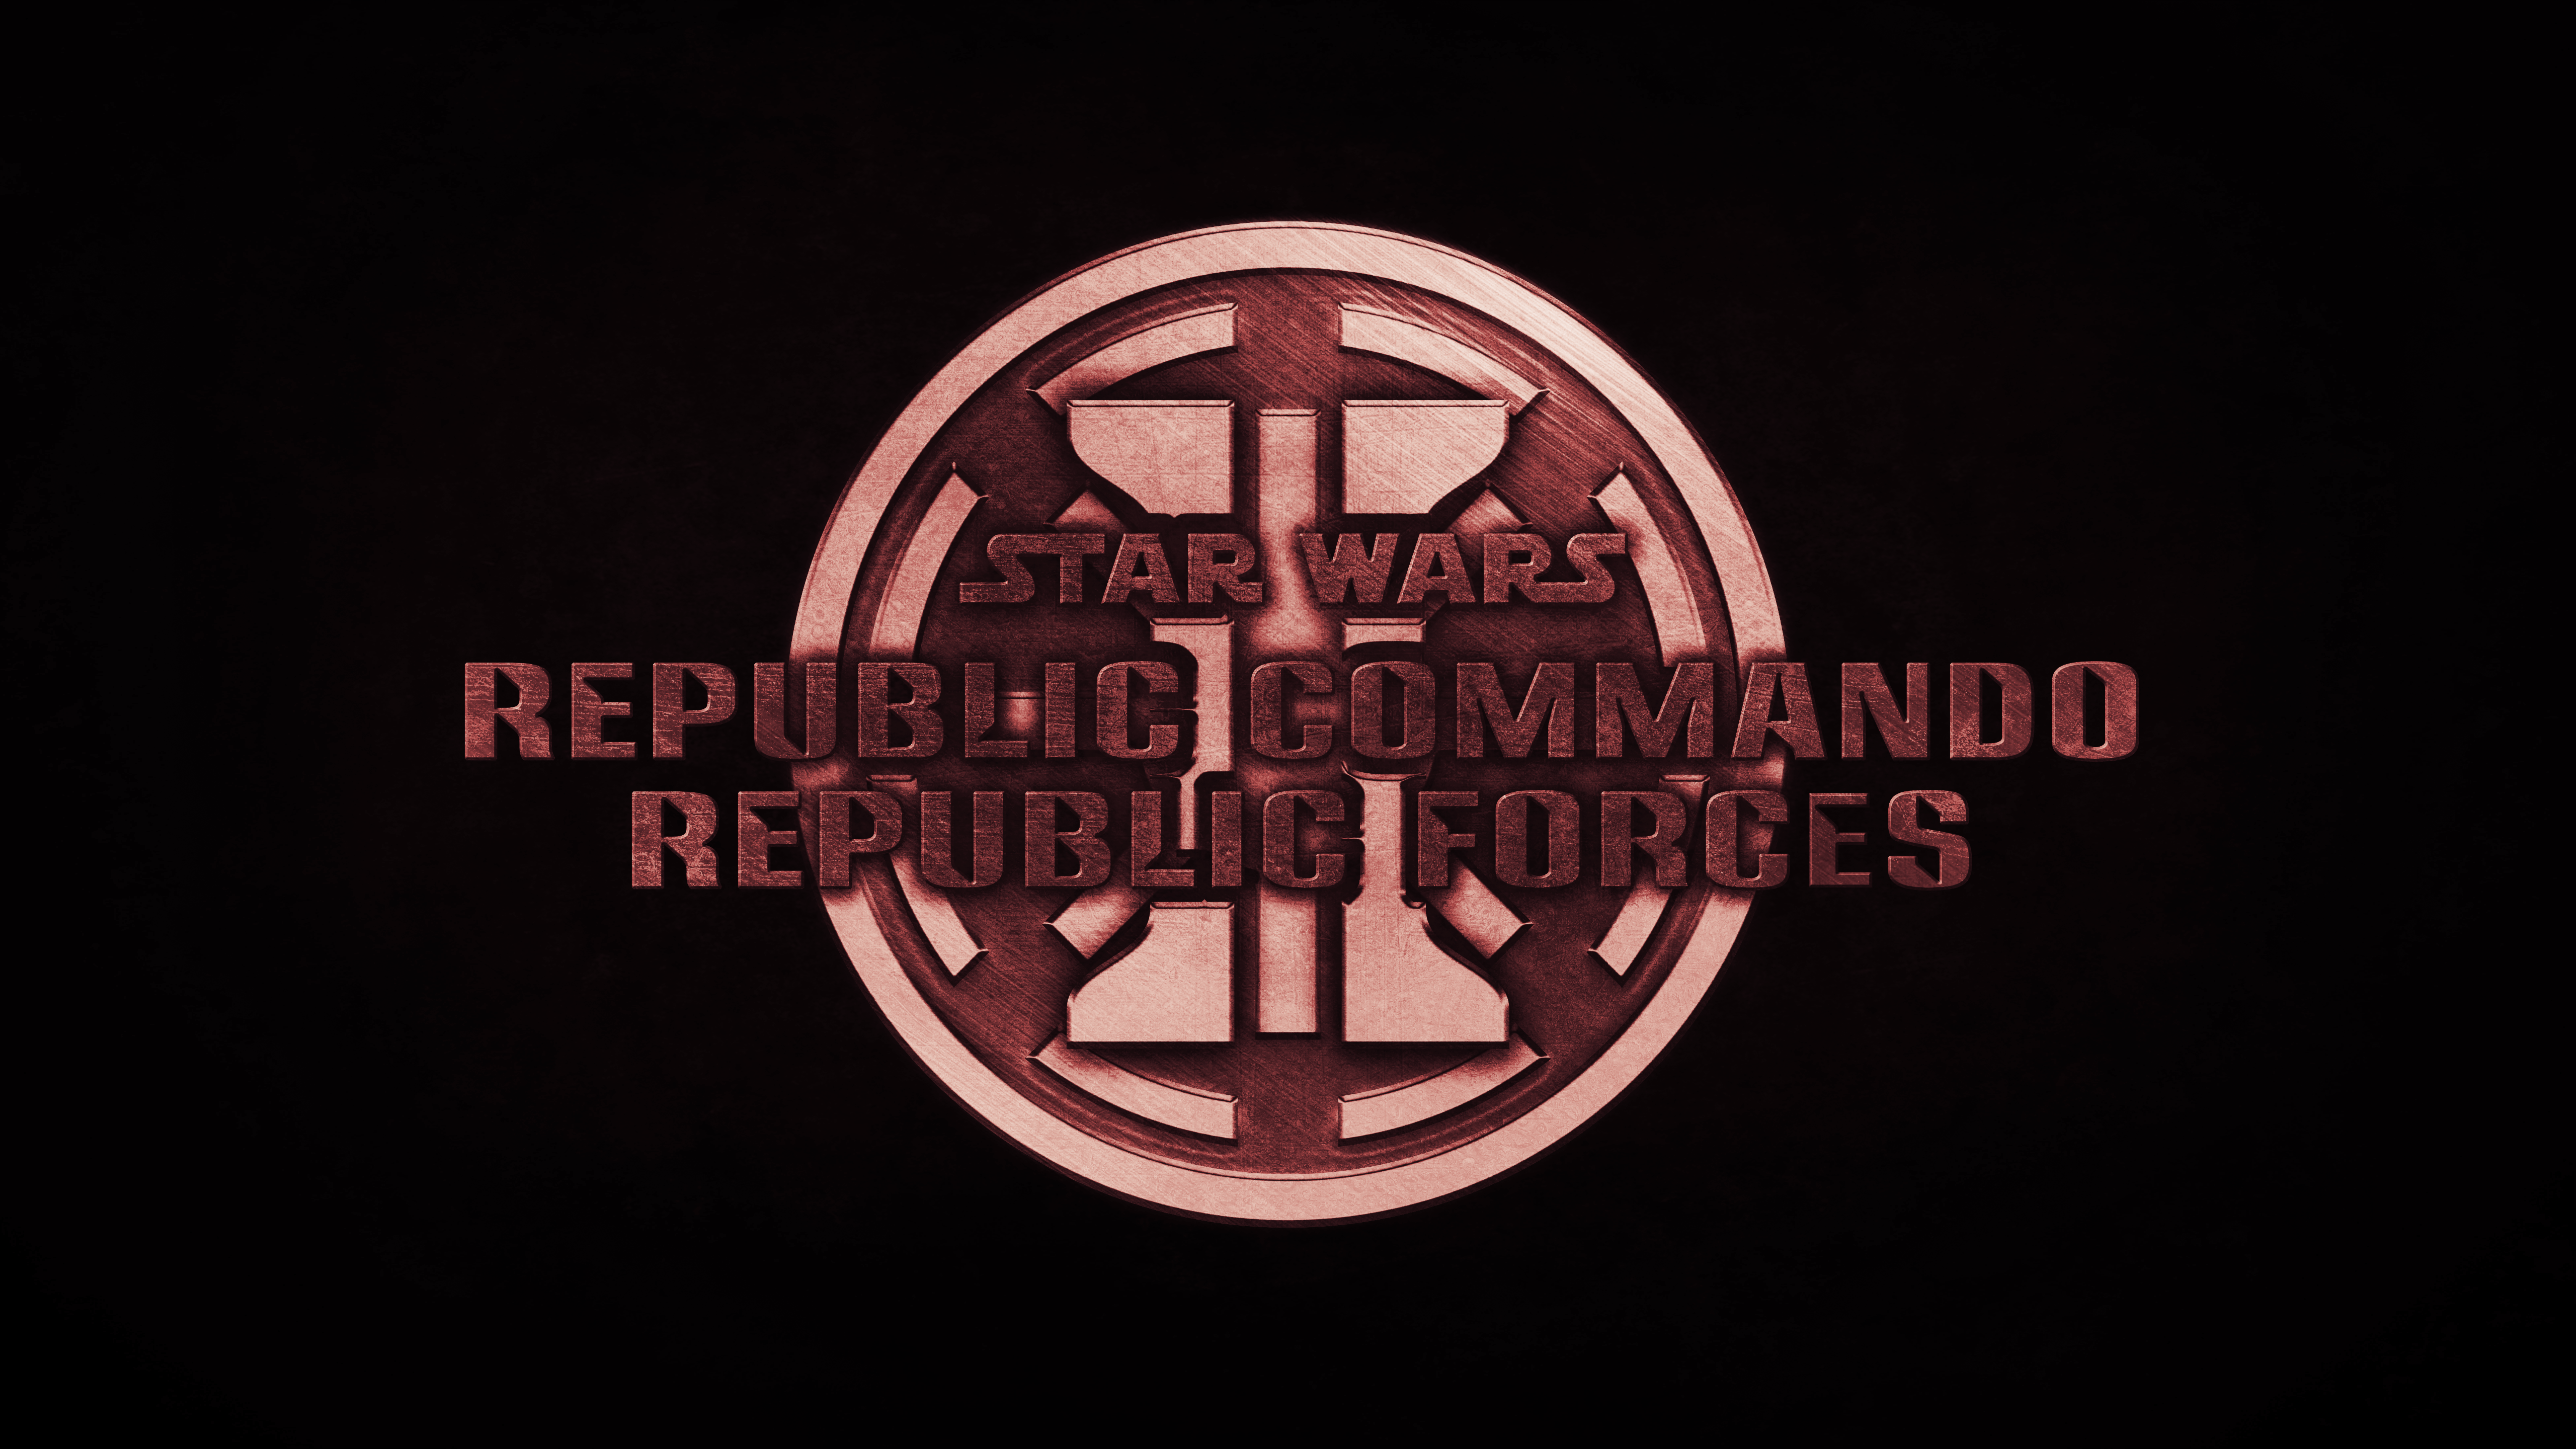 Star Wars Republic Commando 2 Republic Forces Mod Mod Db